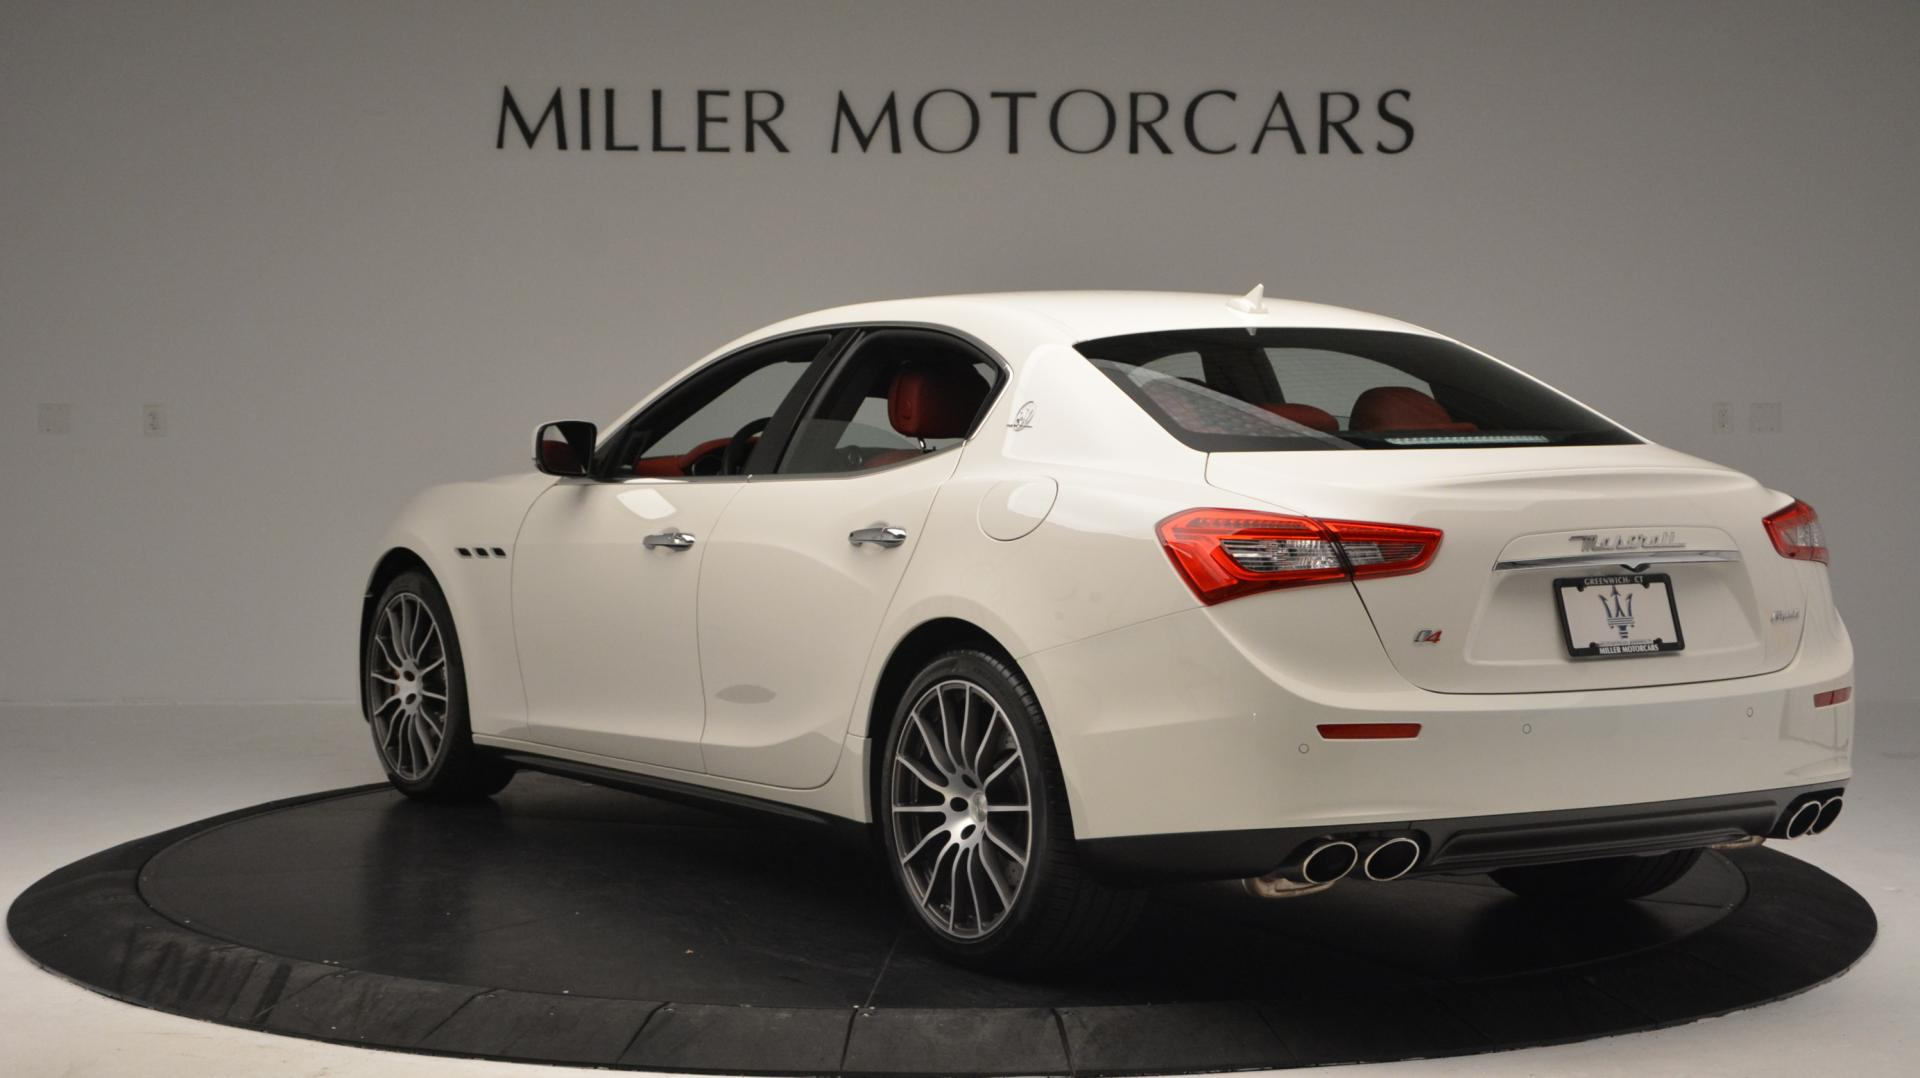 New 2016 Maserati Ghibli S Q4 For Sale ()   Miller Motorcars Stock #W266